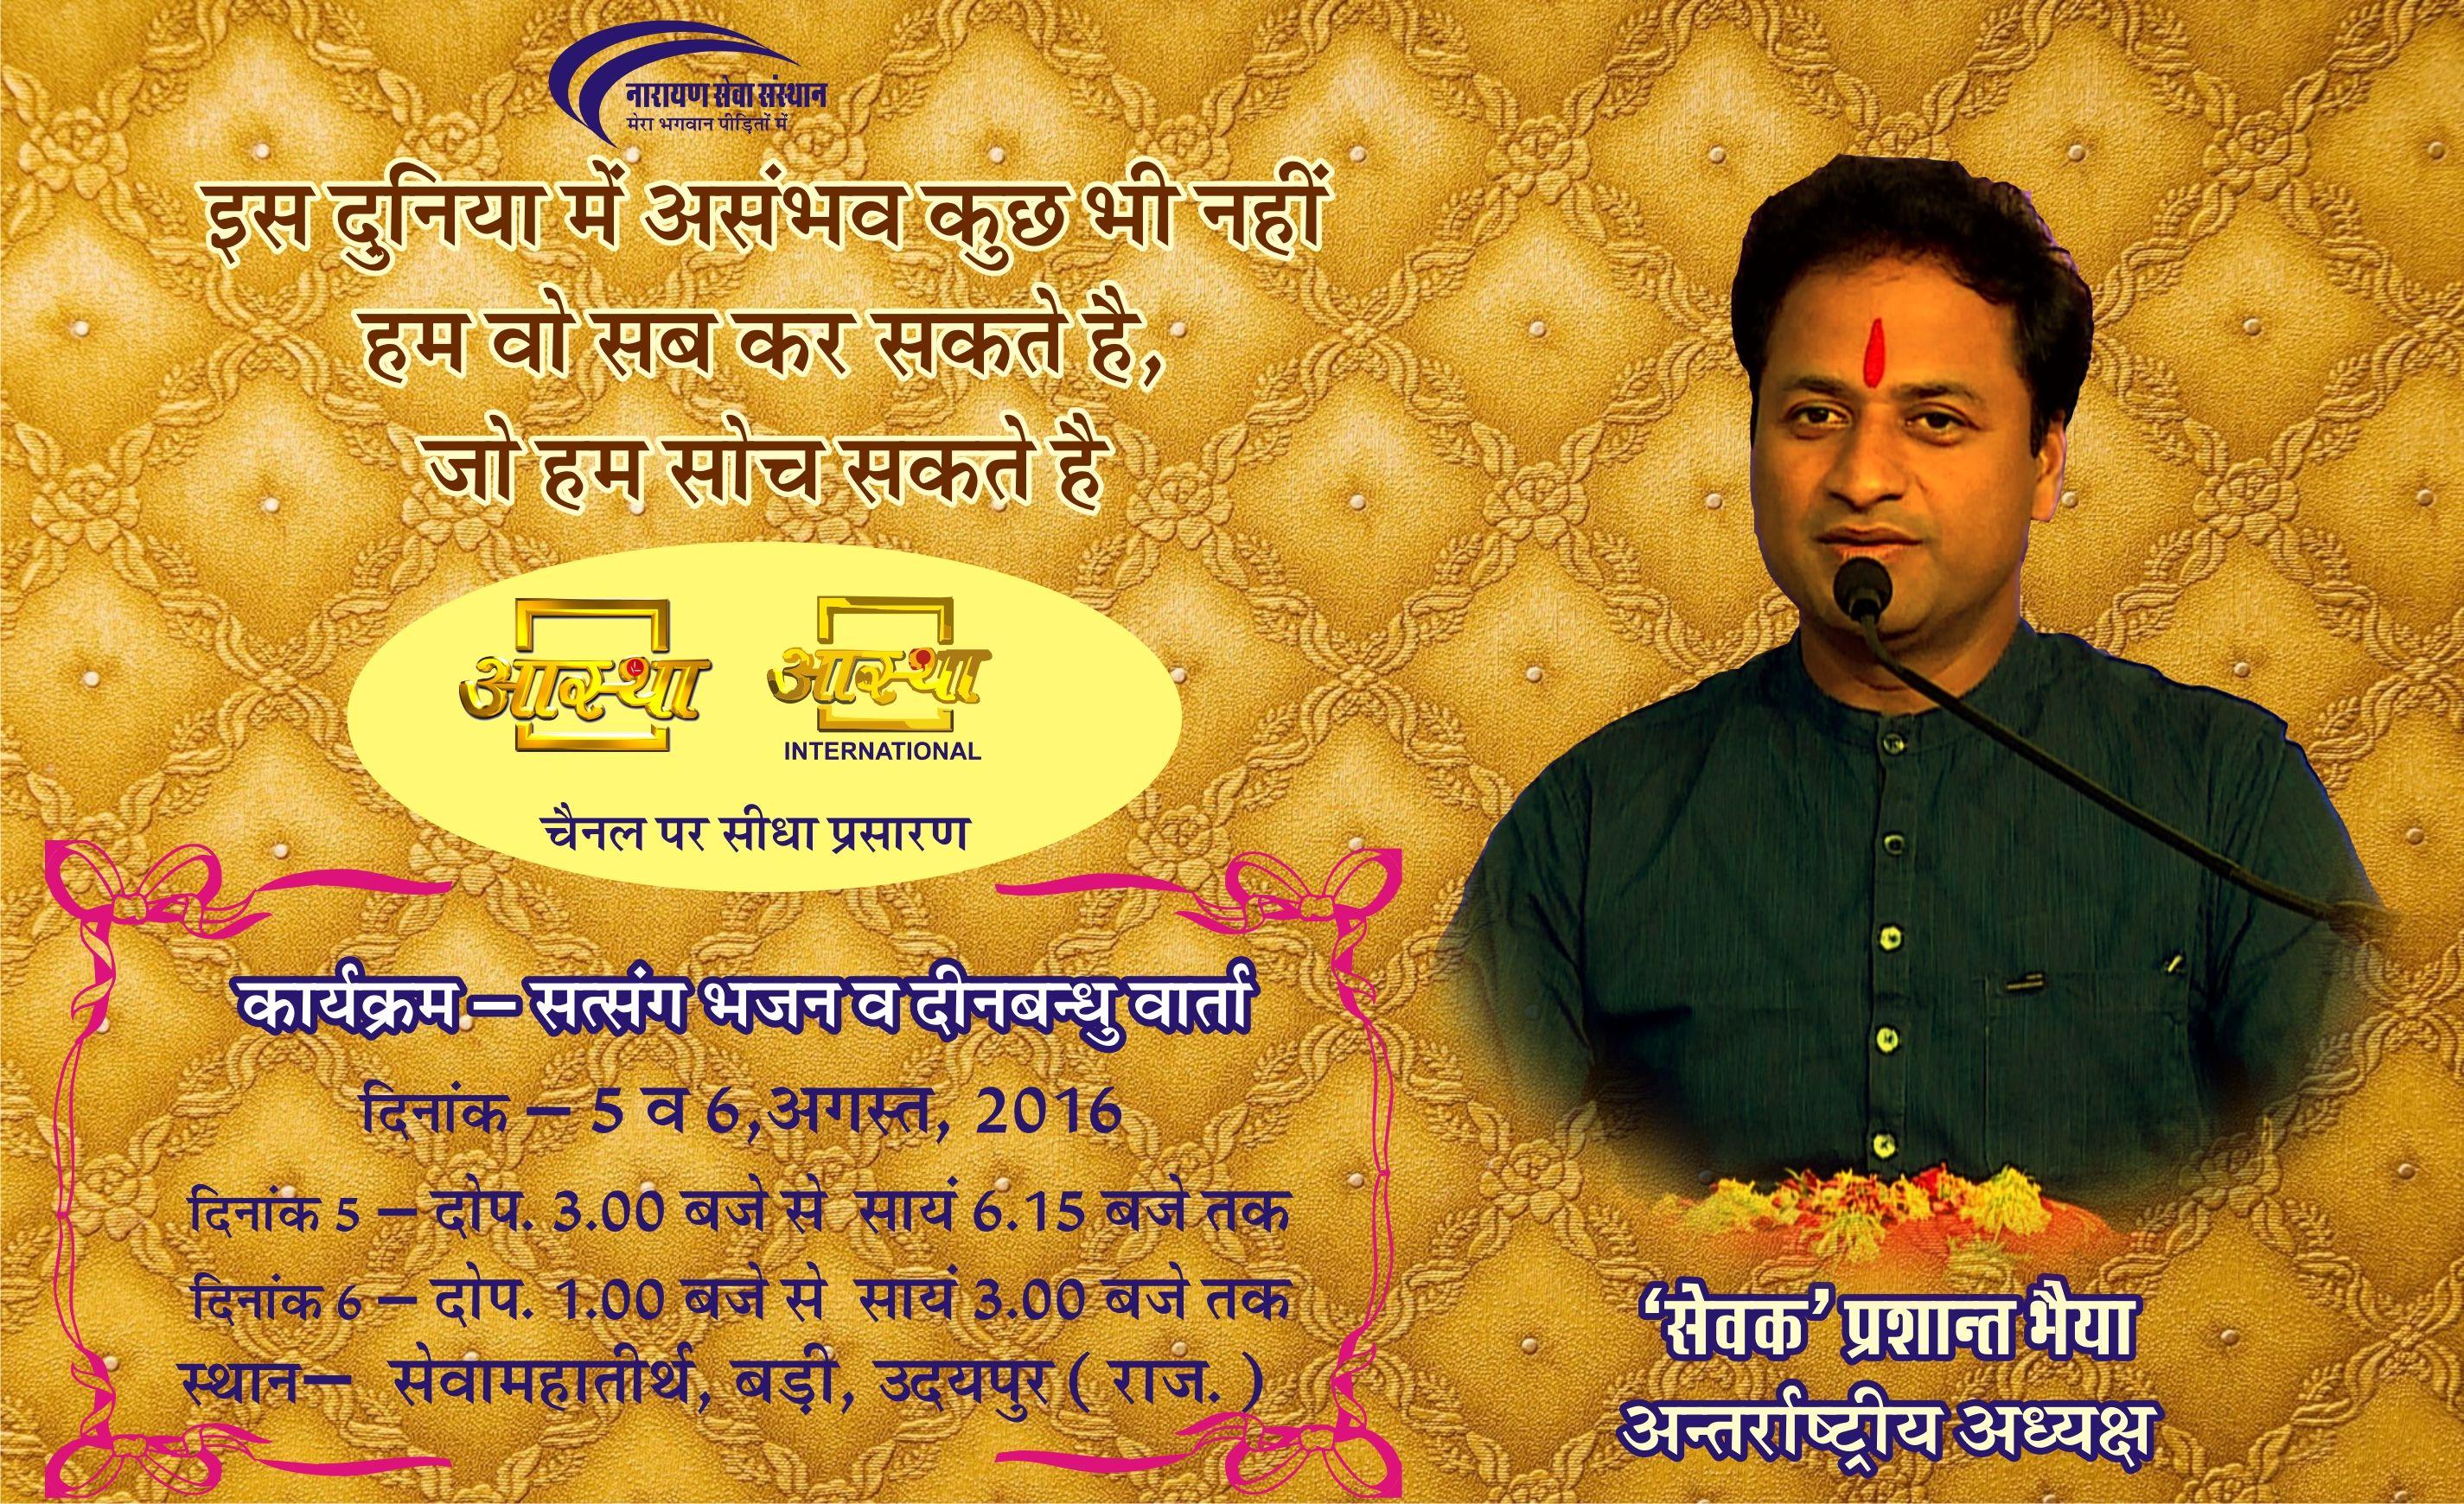 Mr. Prashant Agarwal's next #Live program of Bhajan Satsang and #Deenbandhu #Varta is going to start at 3 pm on Astha TV and Astha International. www.narayanseva.org